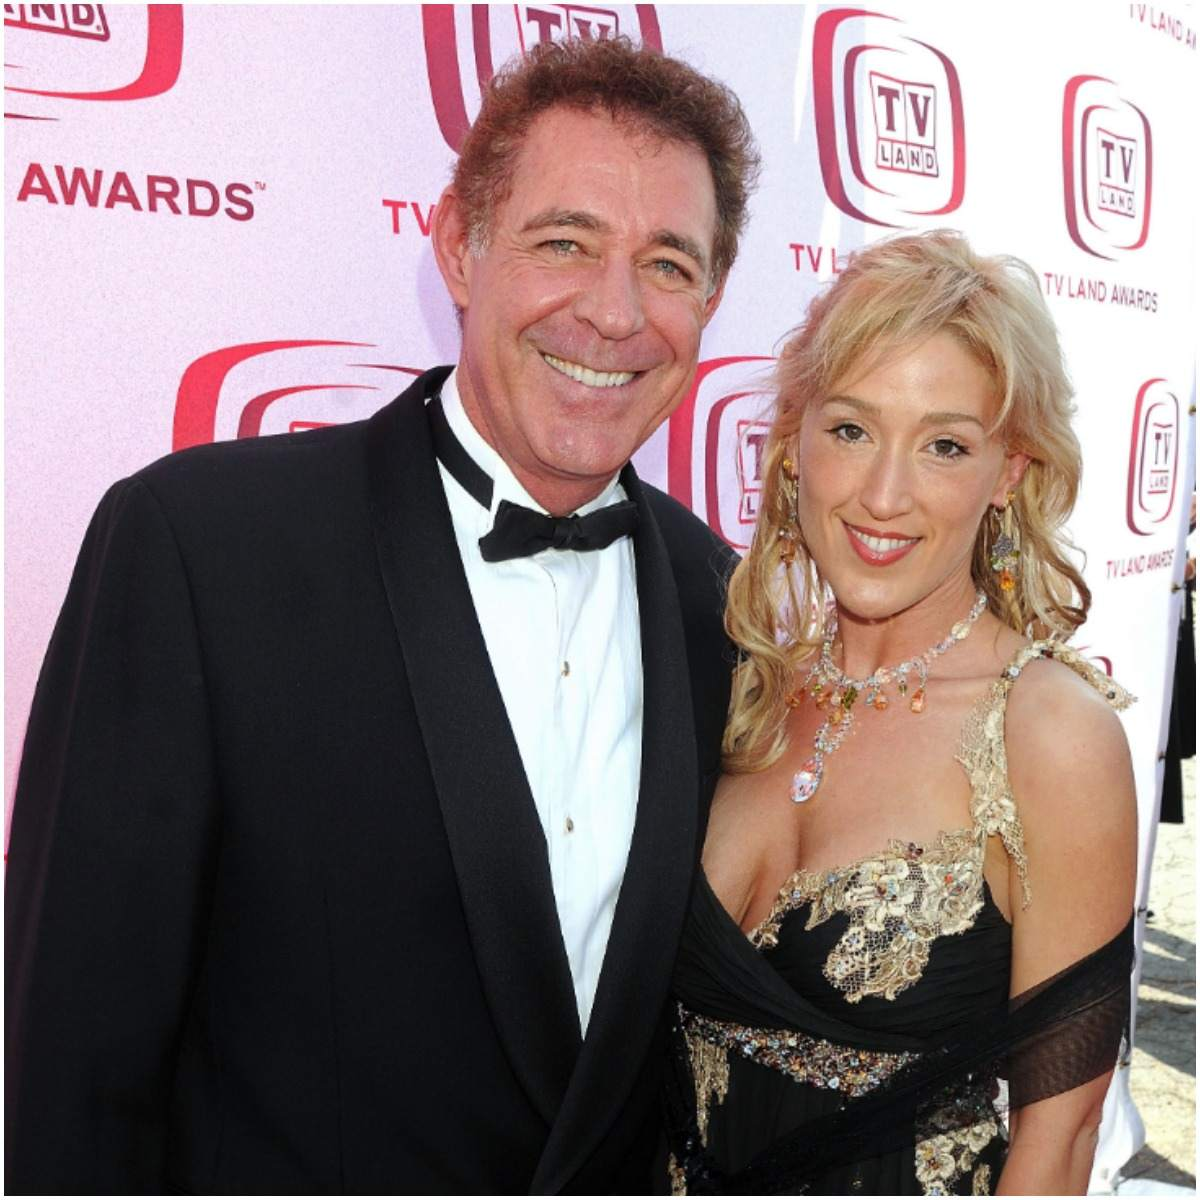 Barry Williams with his girlfriend Elizabeth Kennedy